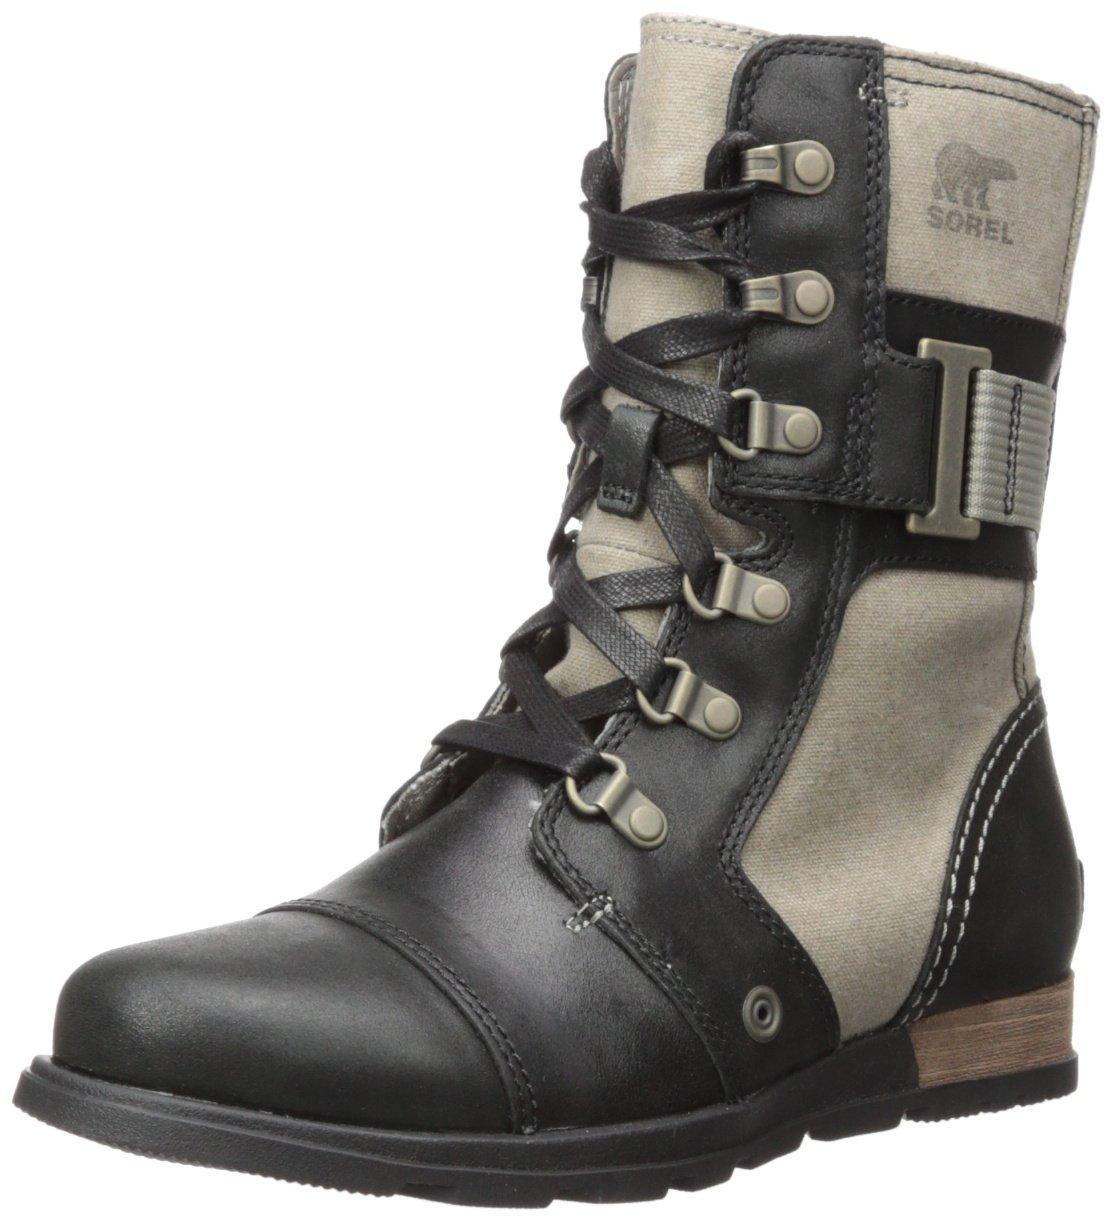 Sorel Women's Major Carly Snow Boot, Wet Sand, Black, 8.5 B US